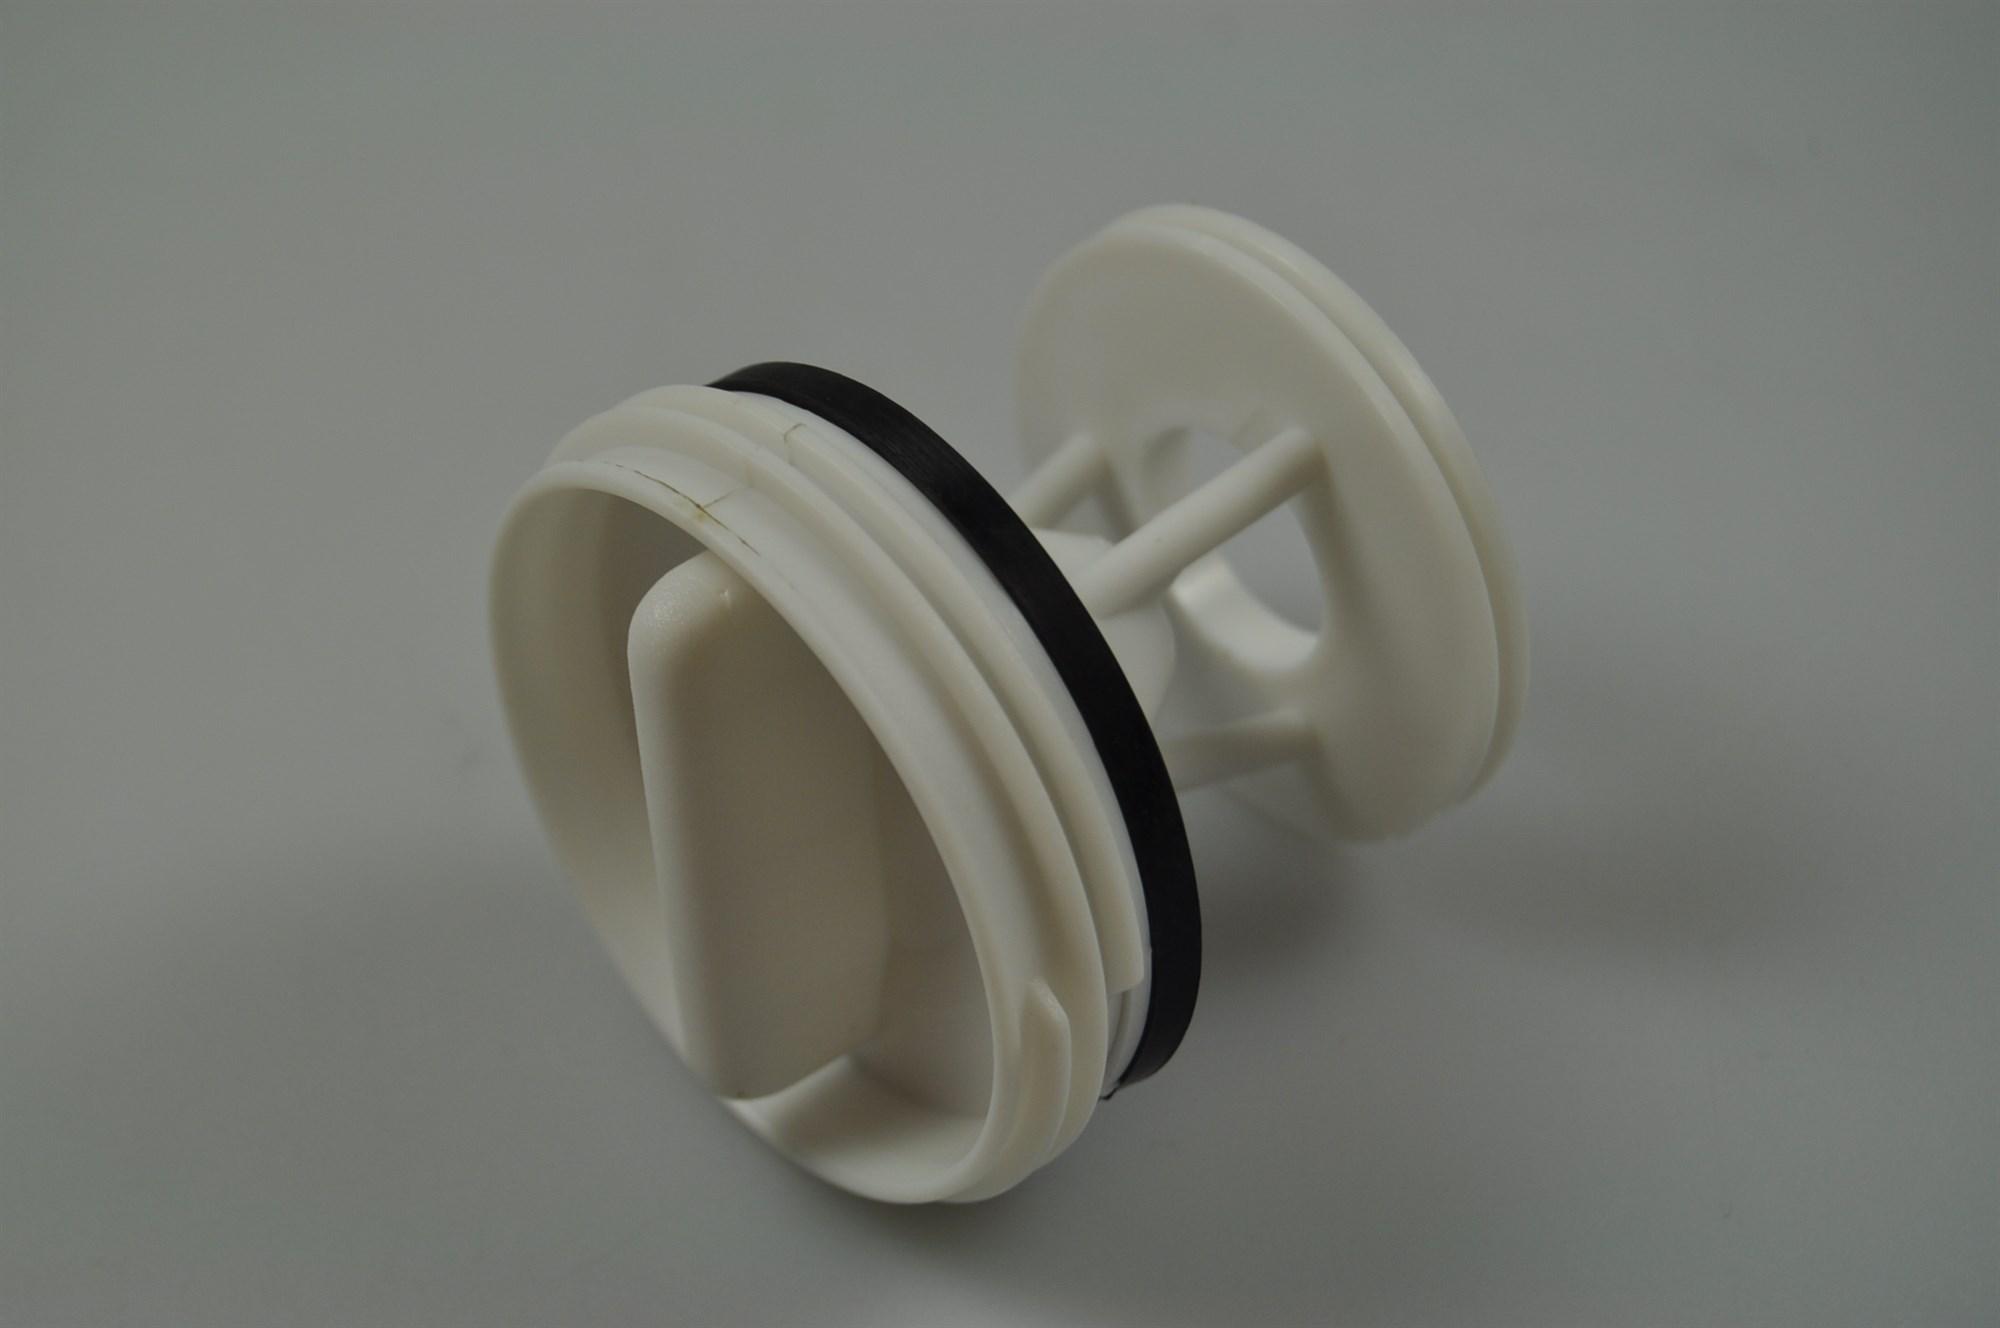 filter siemens waschmaschine. Black Bedroom Furniture Sets. Home Design Ideas